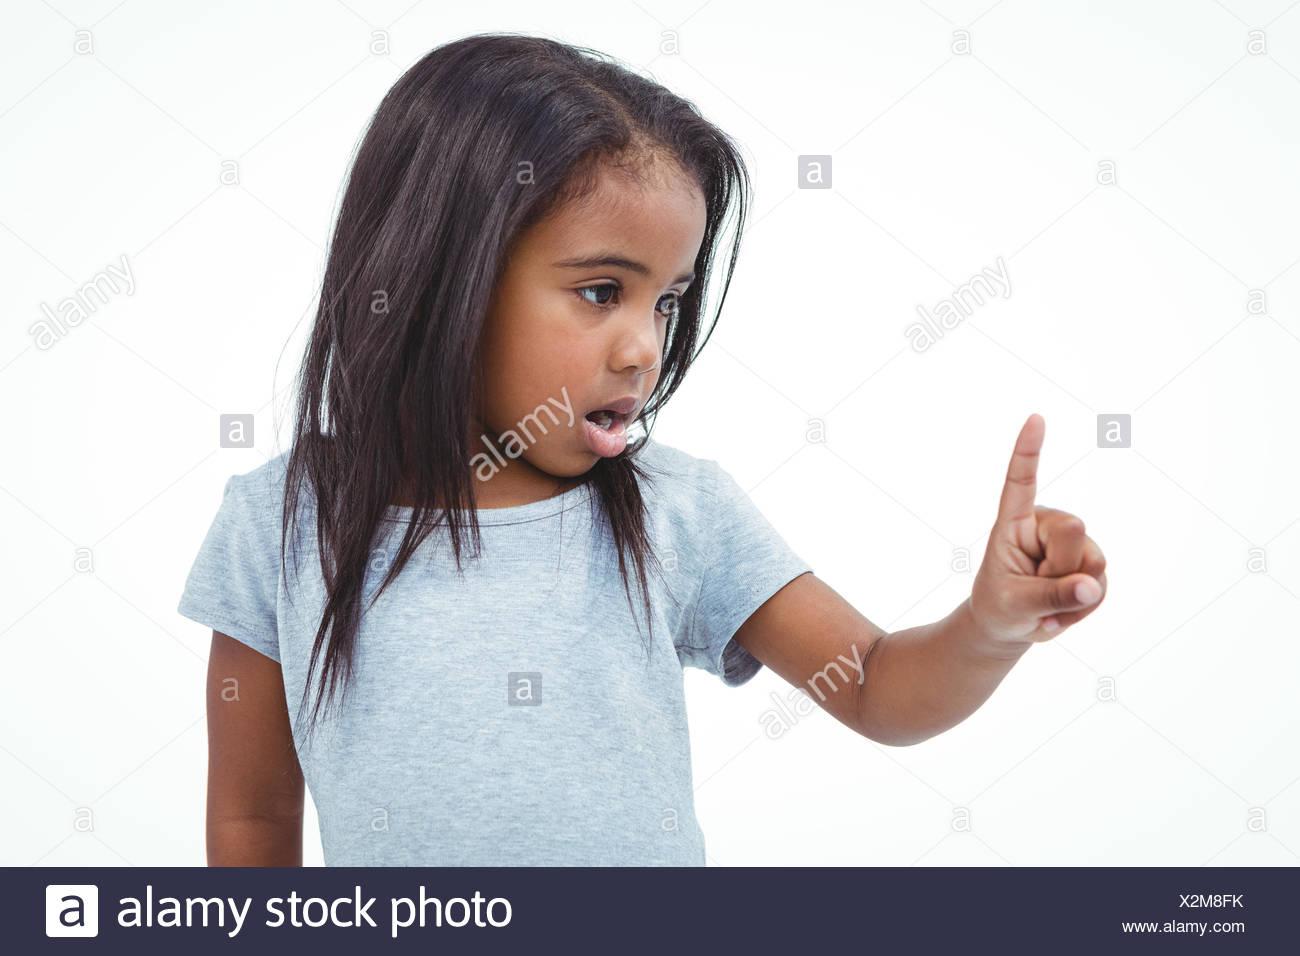 Cute girl shaking finger saying no - Stock Image